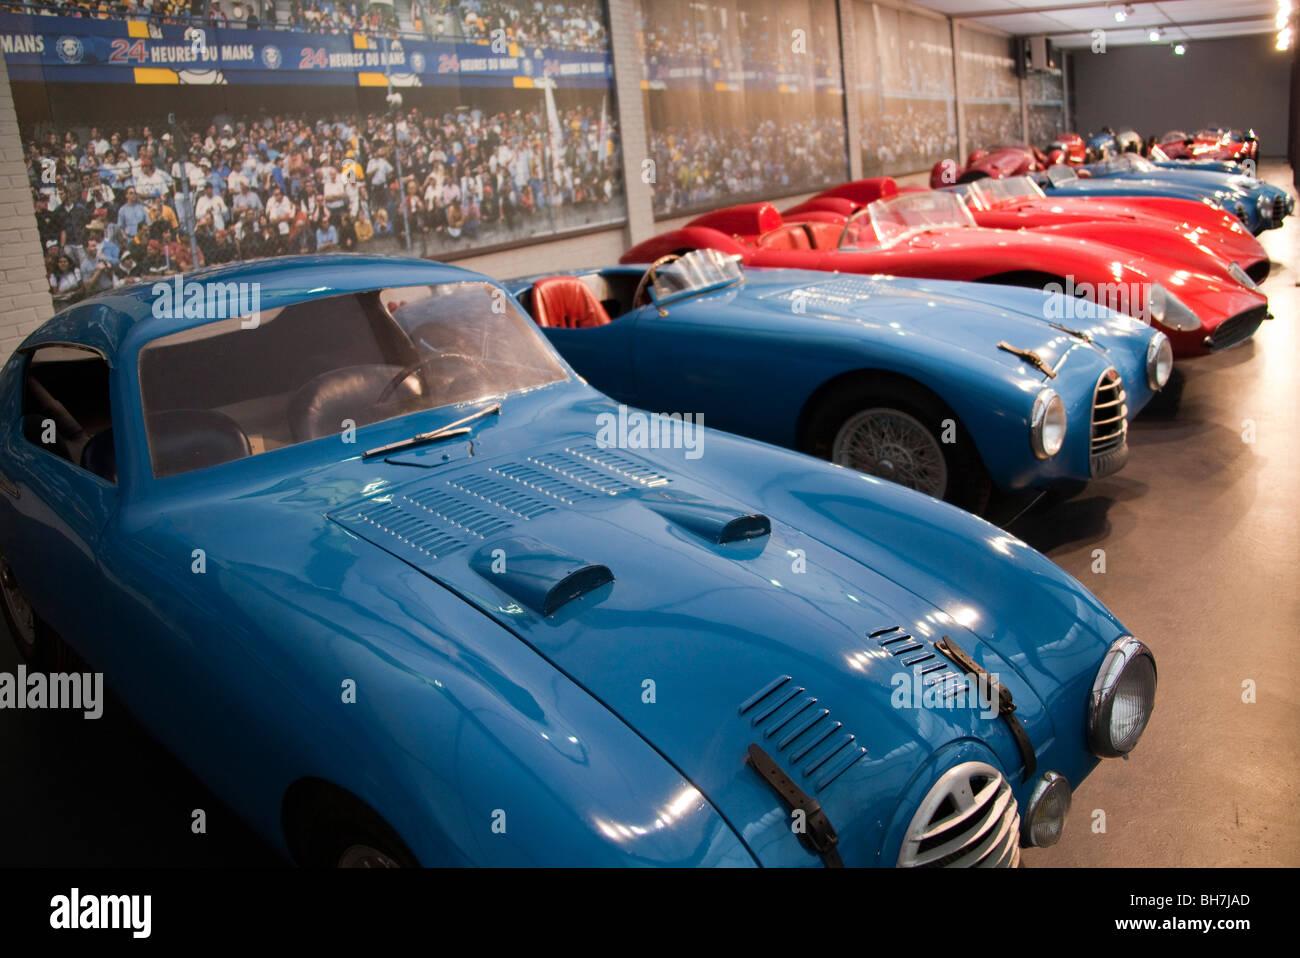 Alpha romeo racing cars on circuit at Schlumpfs motor Museum Mulhouse France  Horizontal 0993313_Schlumpf Museum -